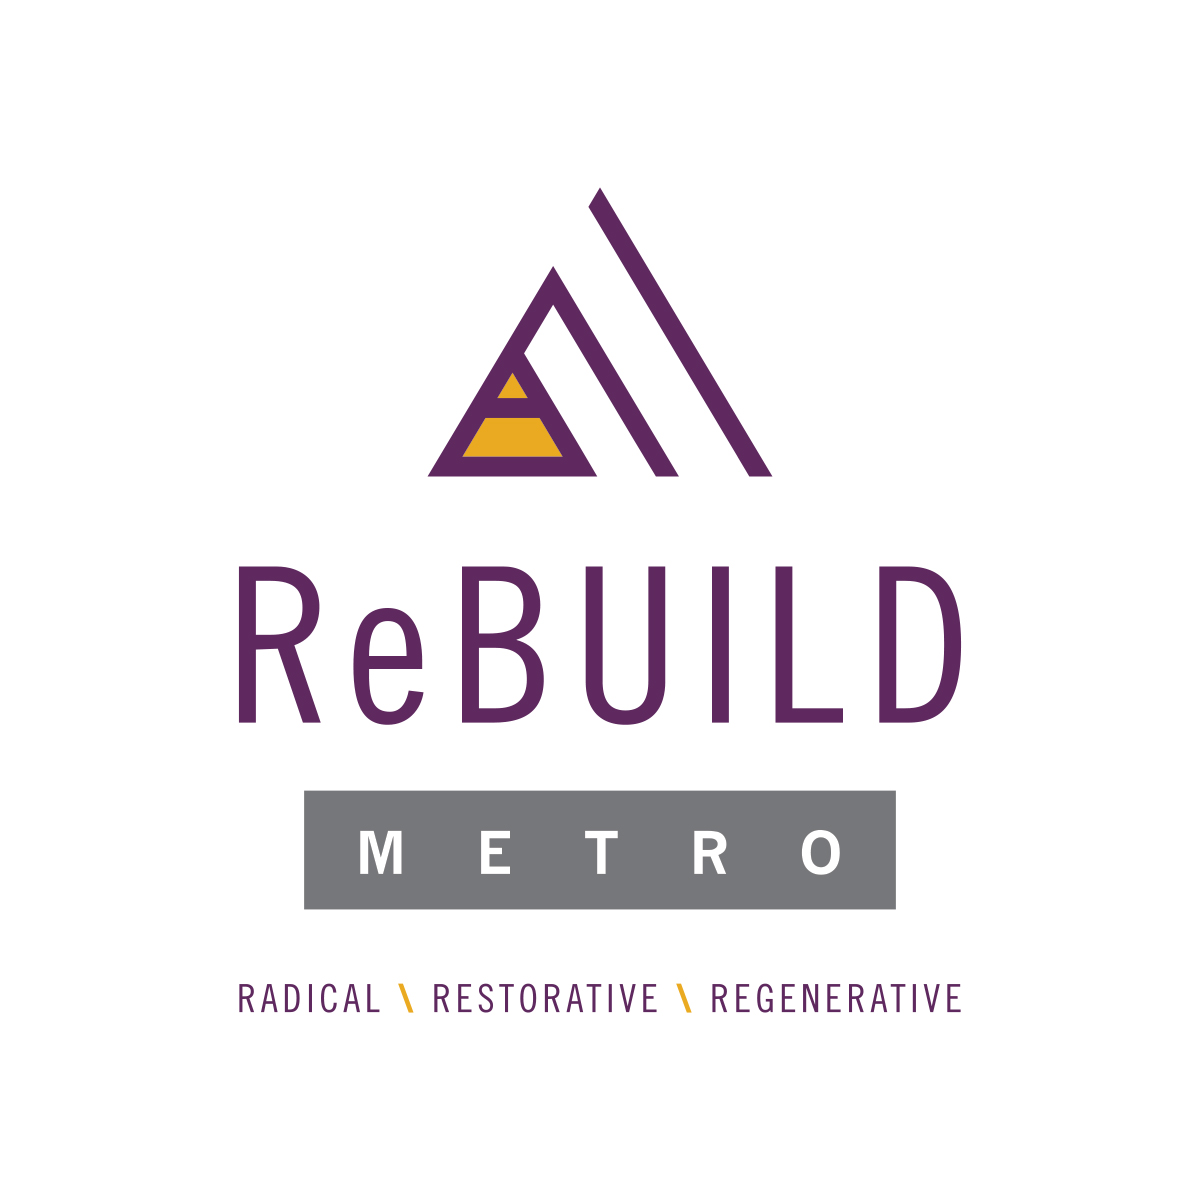 ReBUILD-METRO-logo-withtagline-RGB.JPG